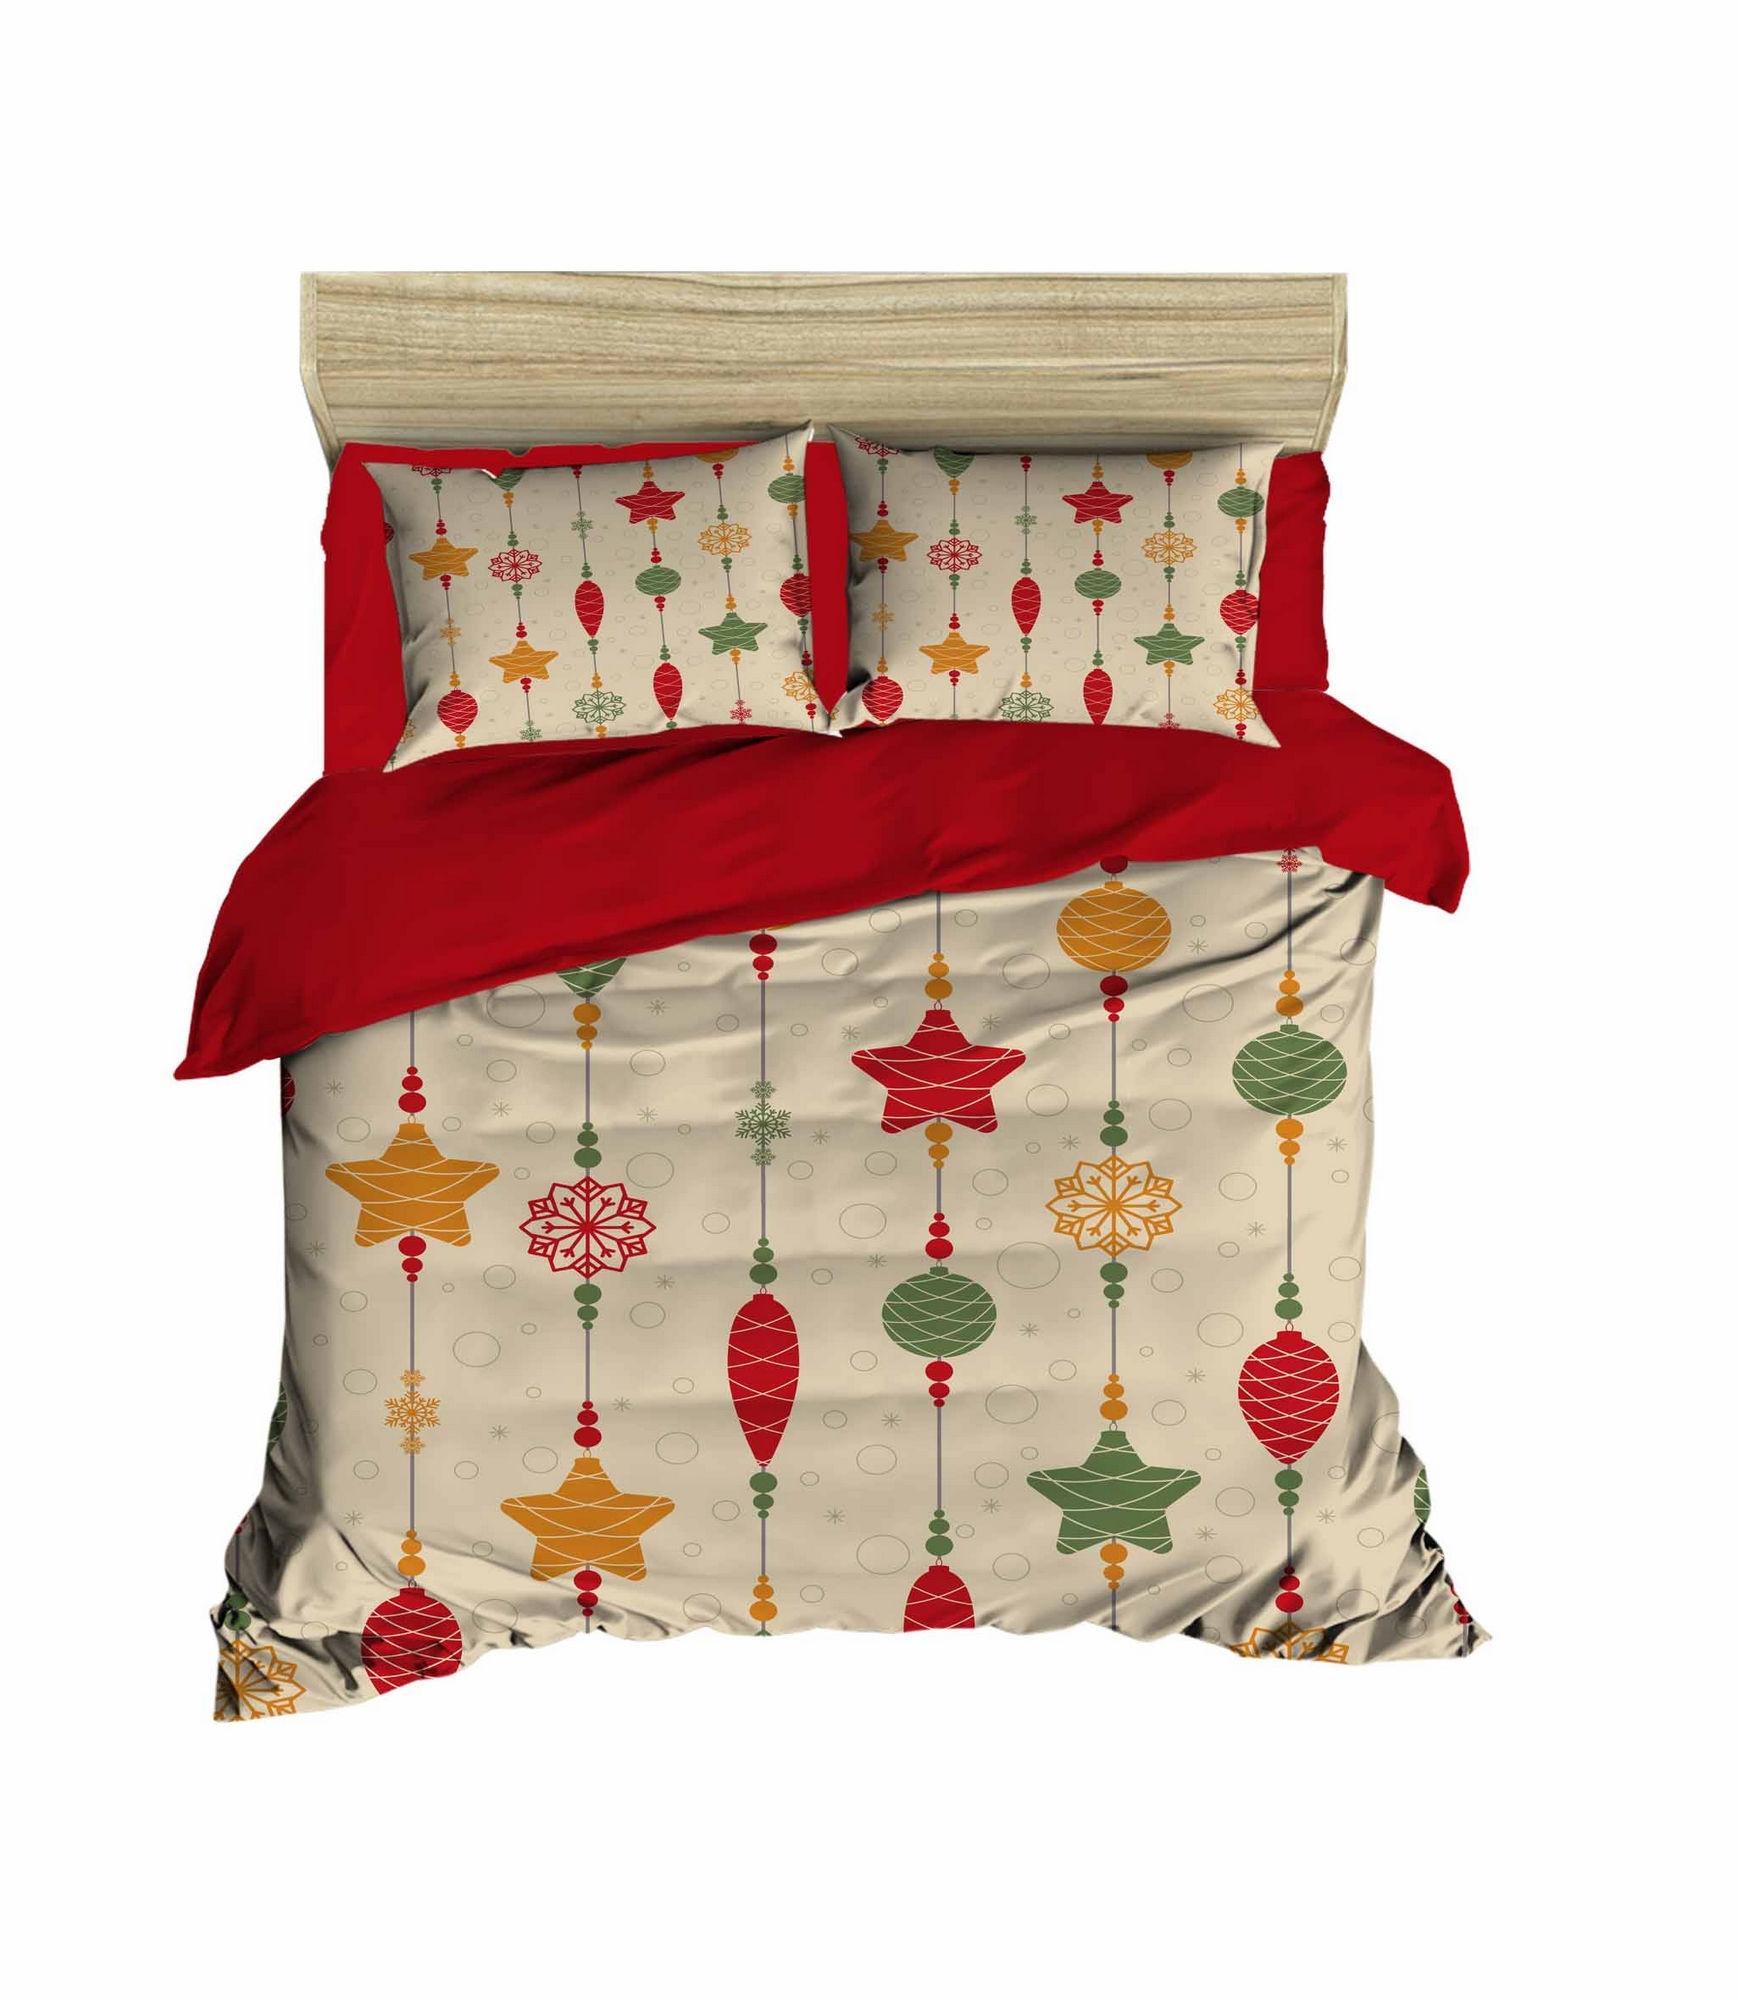 Lenjerie de pat din bumbac si microfibra Christmas 454 Multicolor, 200 x 220 cm